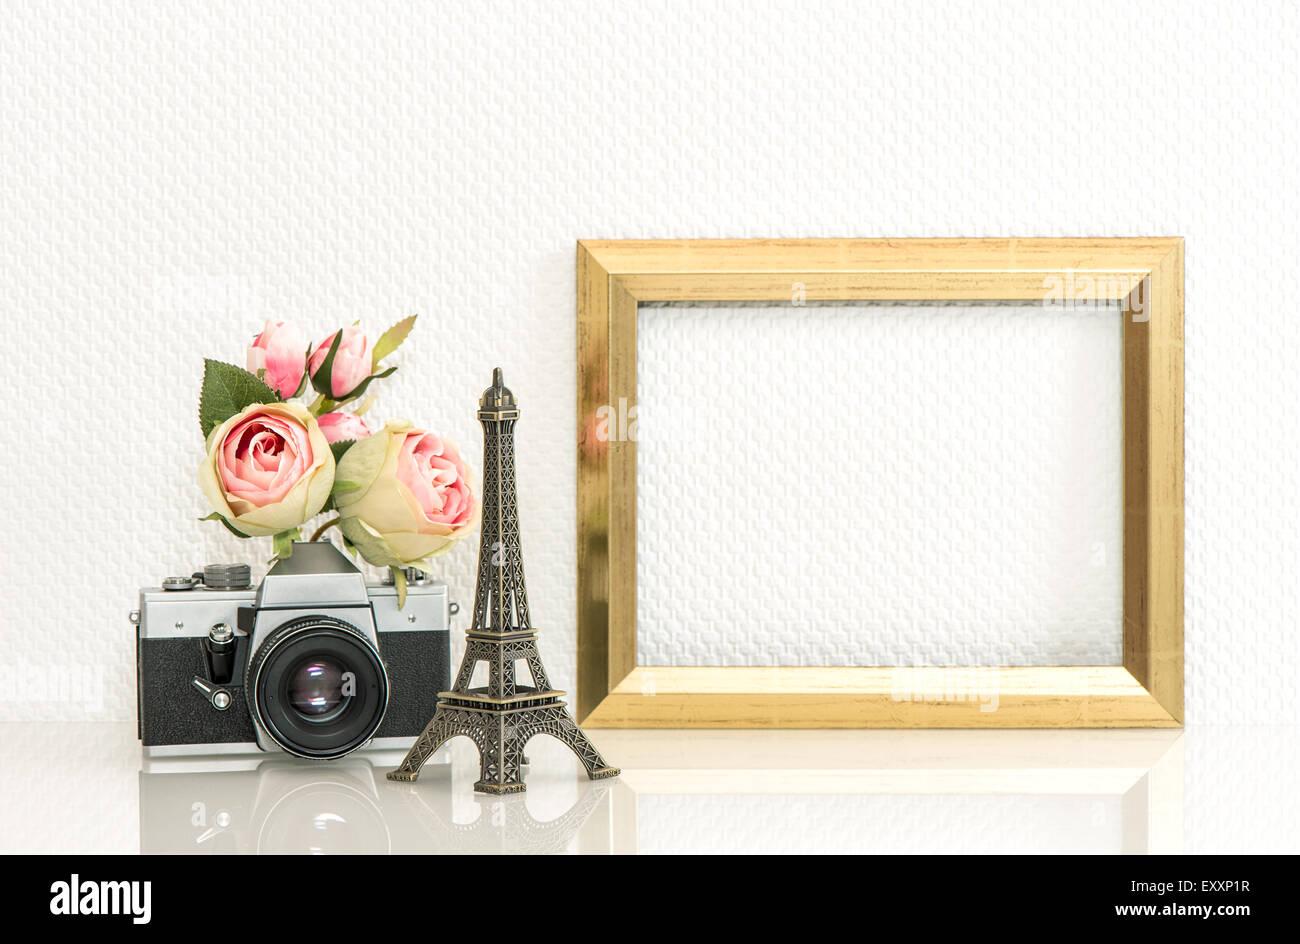 Goldene Bilderrahmen, Rosenblüten und kein Name-Vintage-Kamera ...